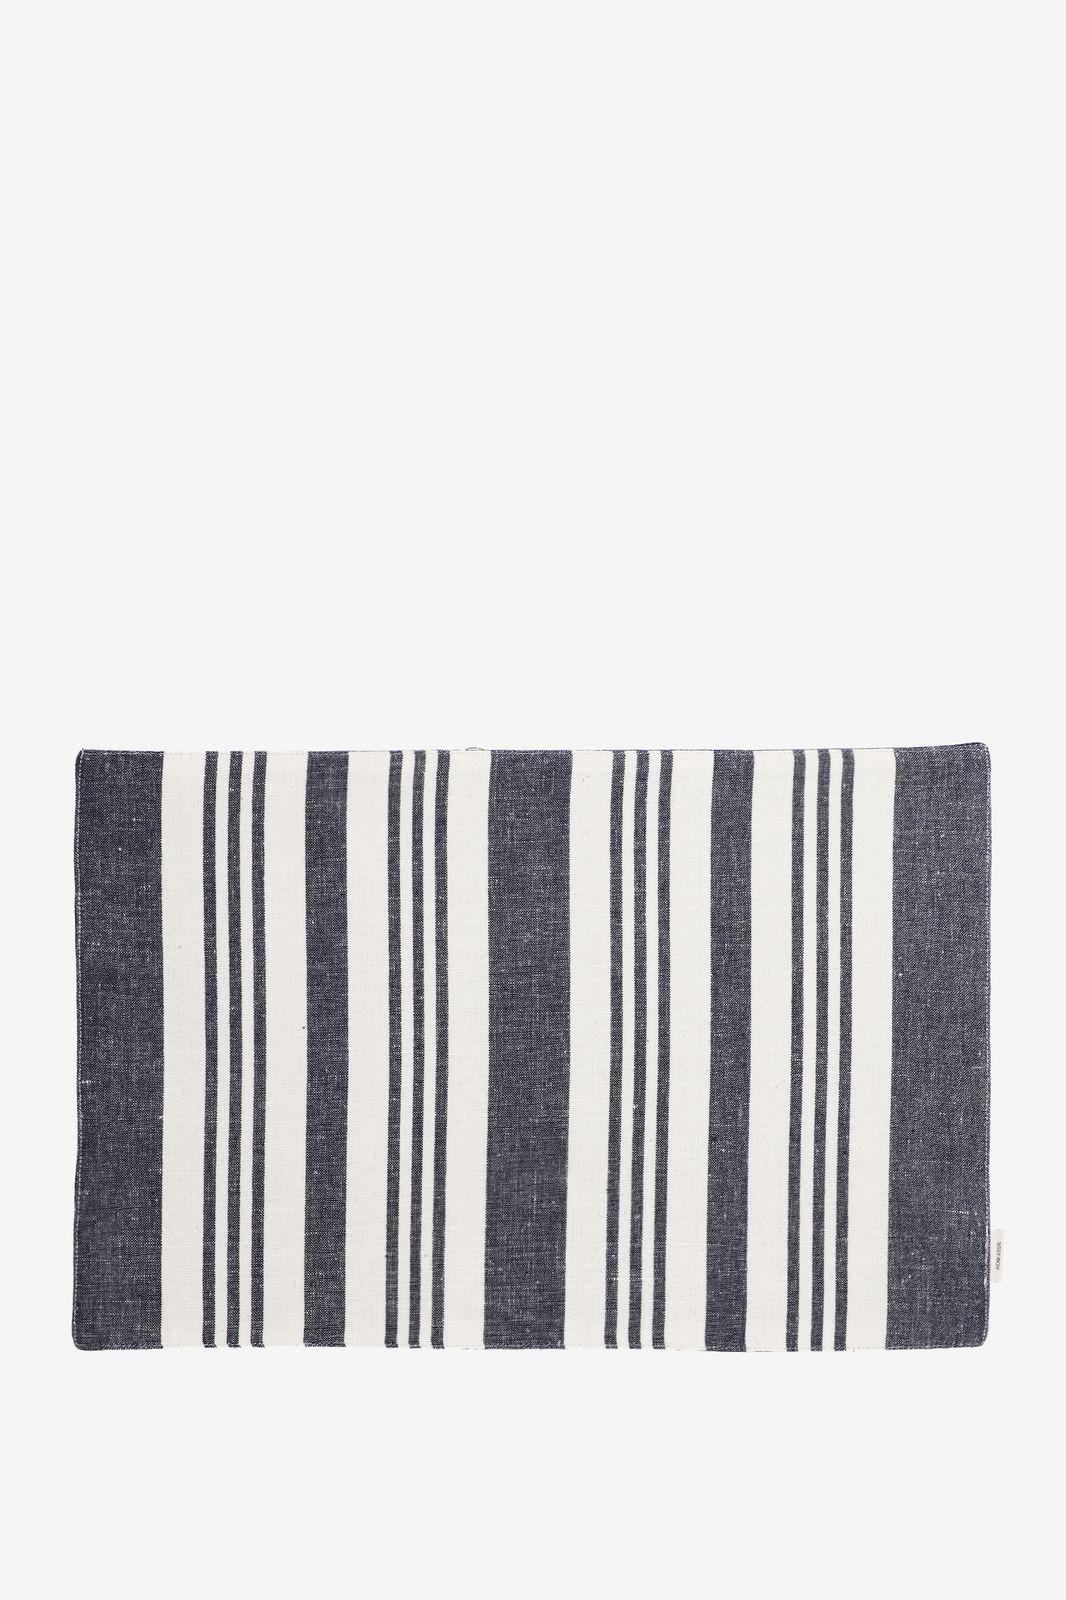 Donkerblauwe placemat set linnen